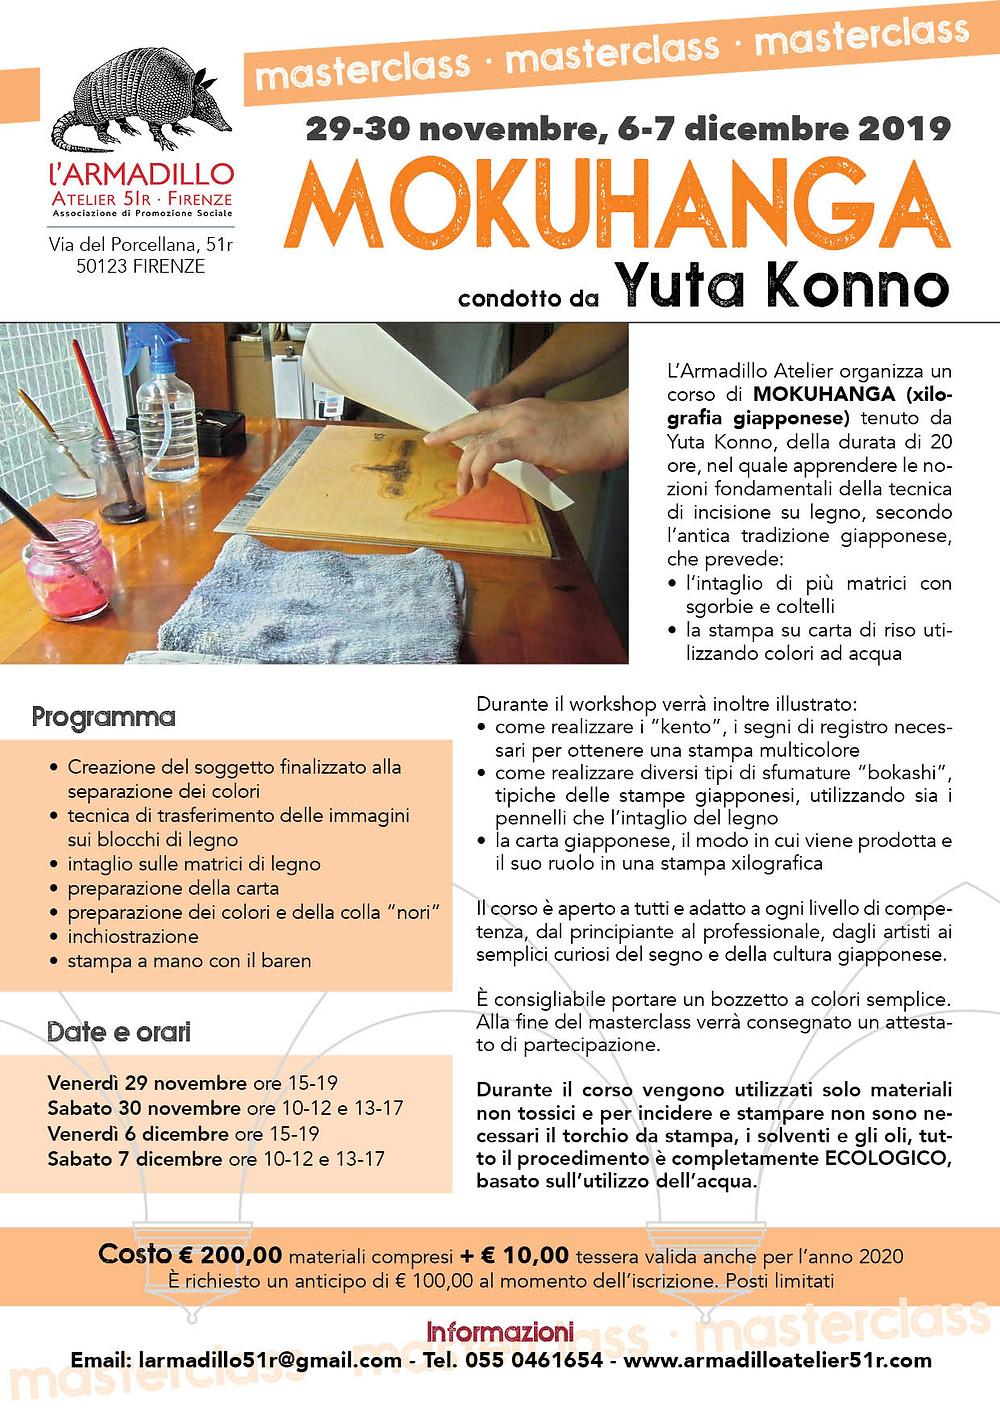 Masterclass di Mokuhanga con Yuta Konno all'Armadillo Atelier